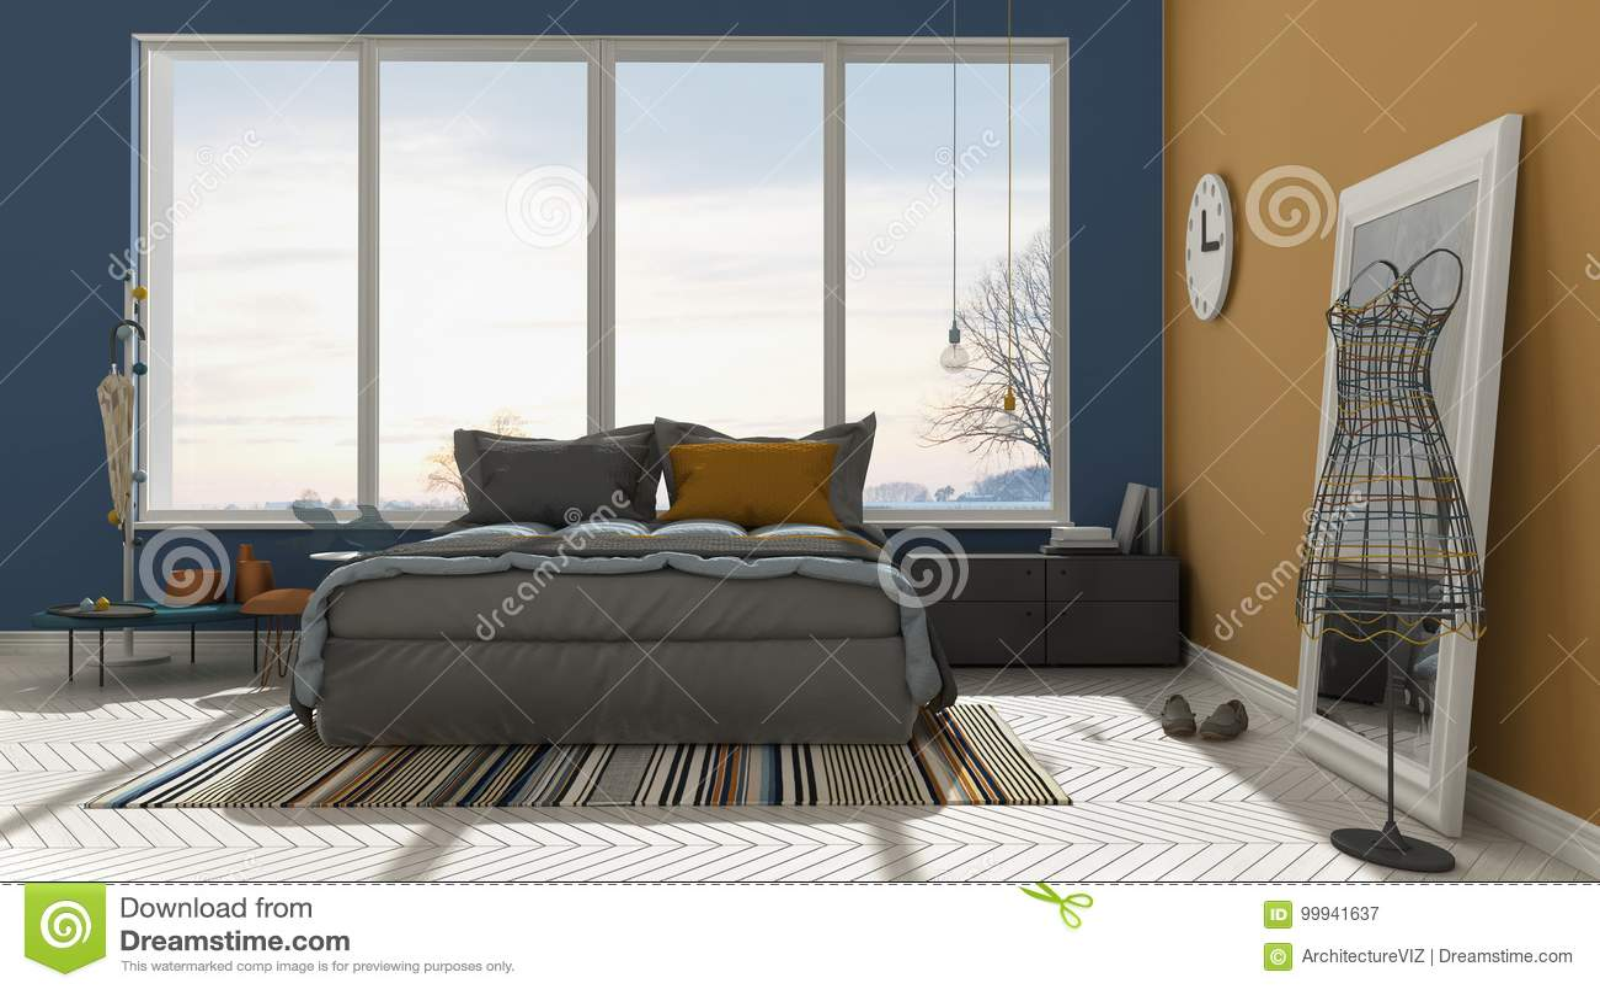 Colored Modern Blue And Orange Bedroom With Big Panoramic Window Sunset Sunrise Architecture Minimalist Interior Design